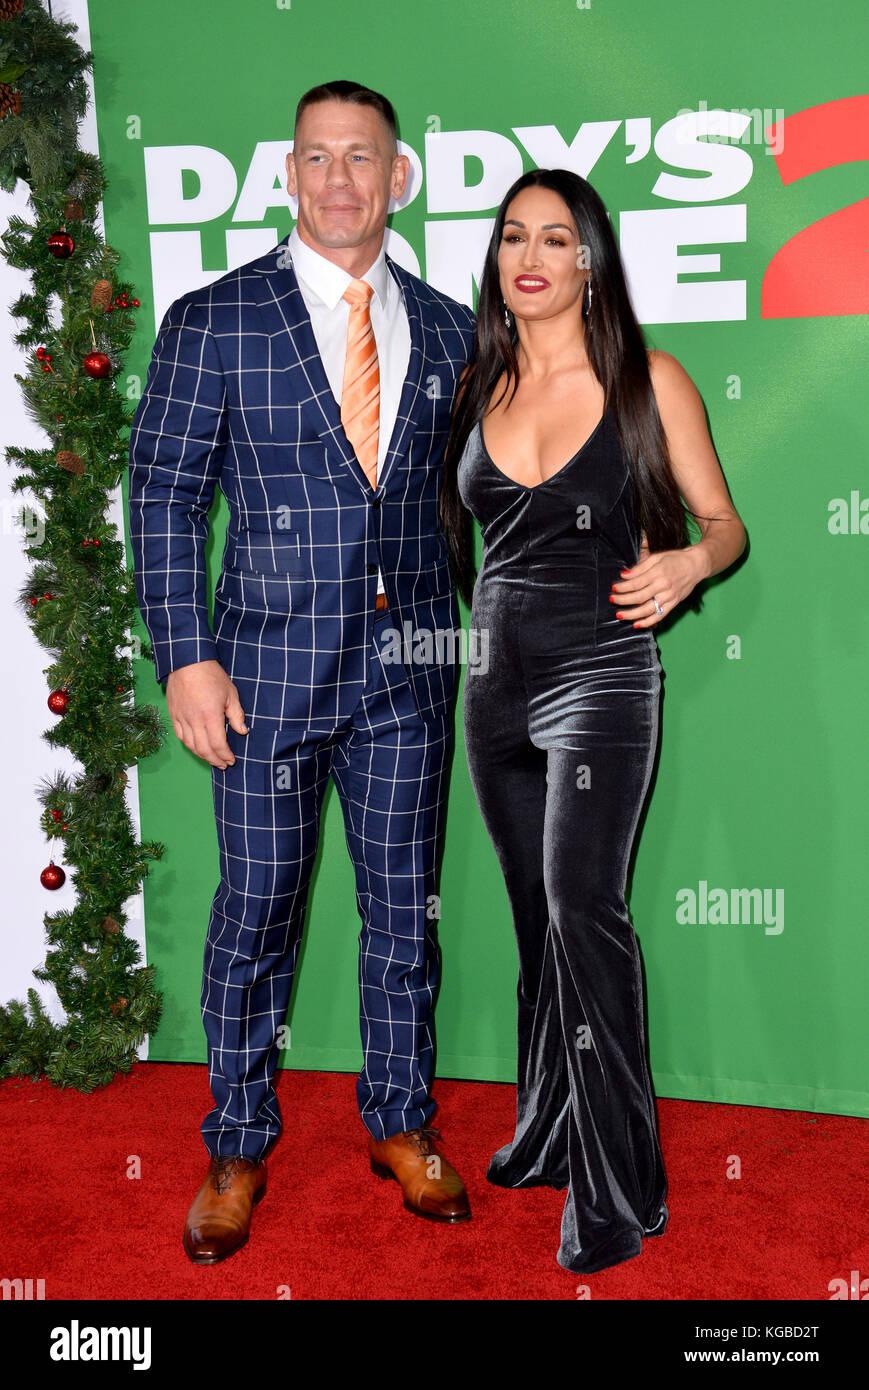 Los Angeles, USA. 05th Nov, 2017. John Cena & Nikki Bella at the ...